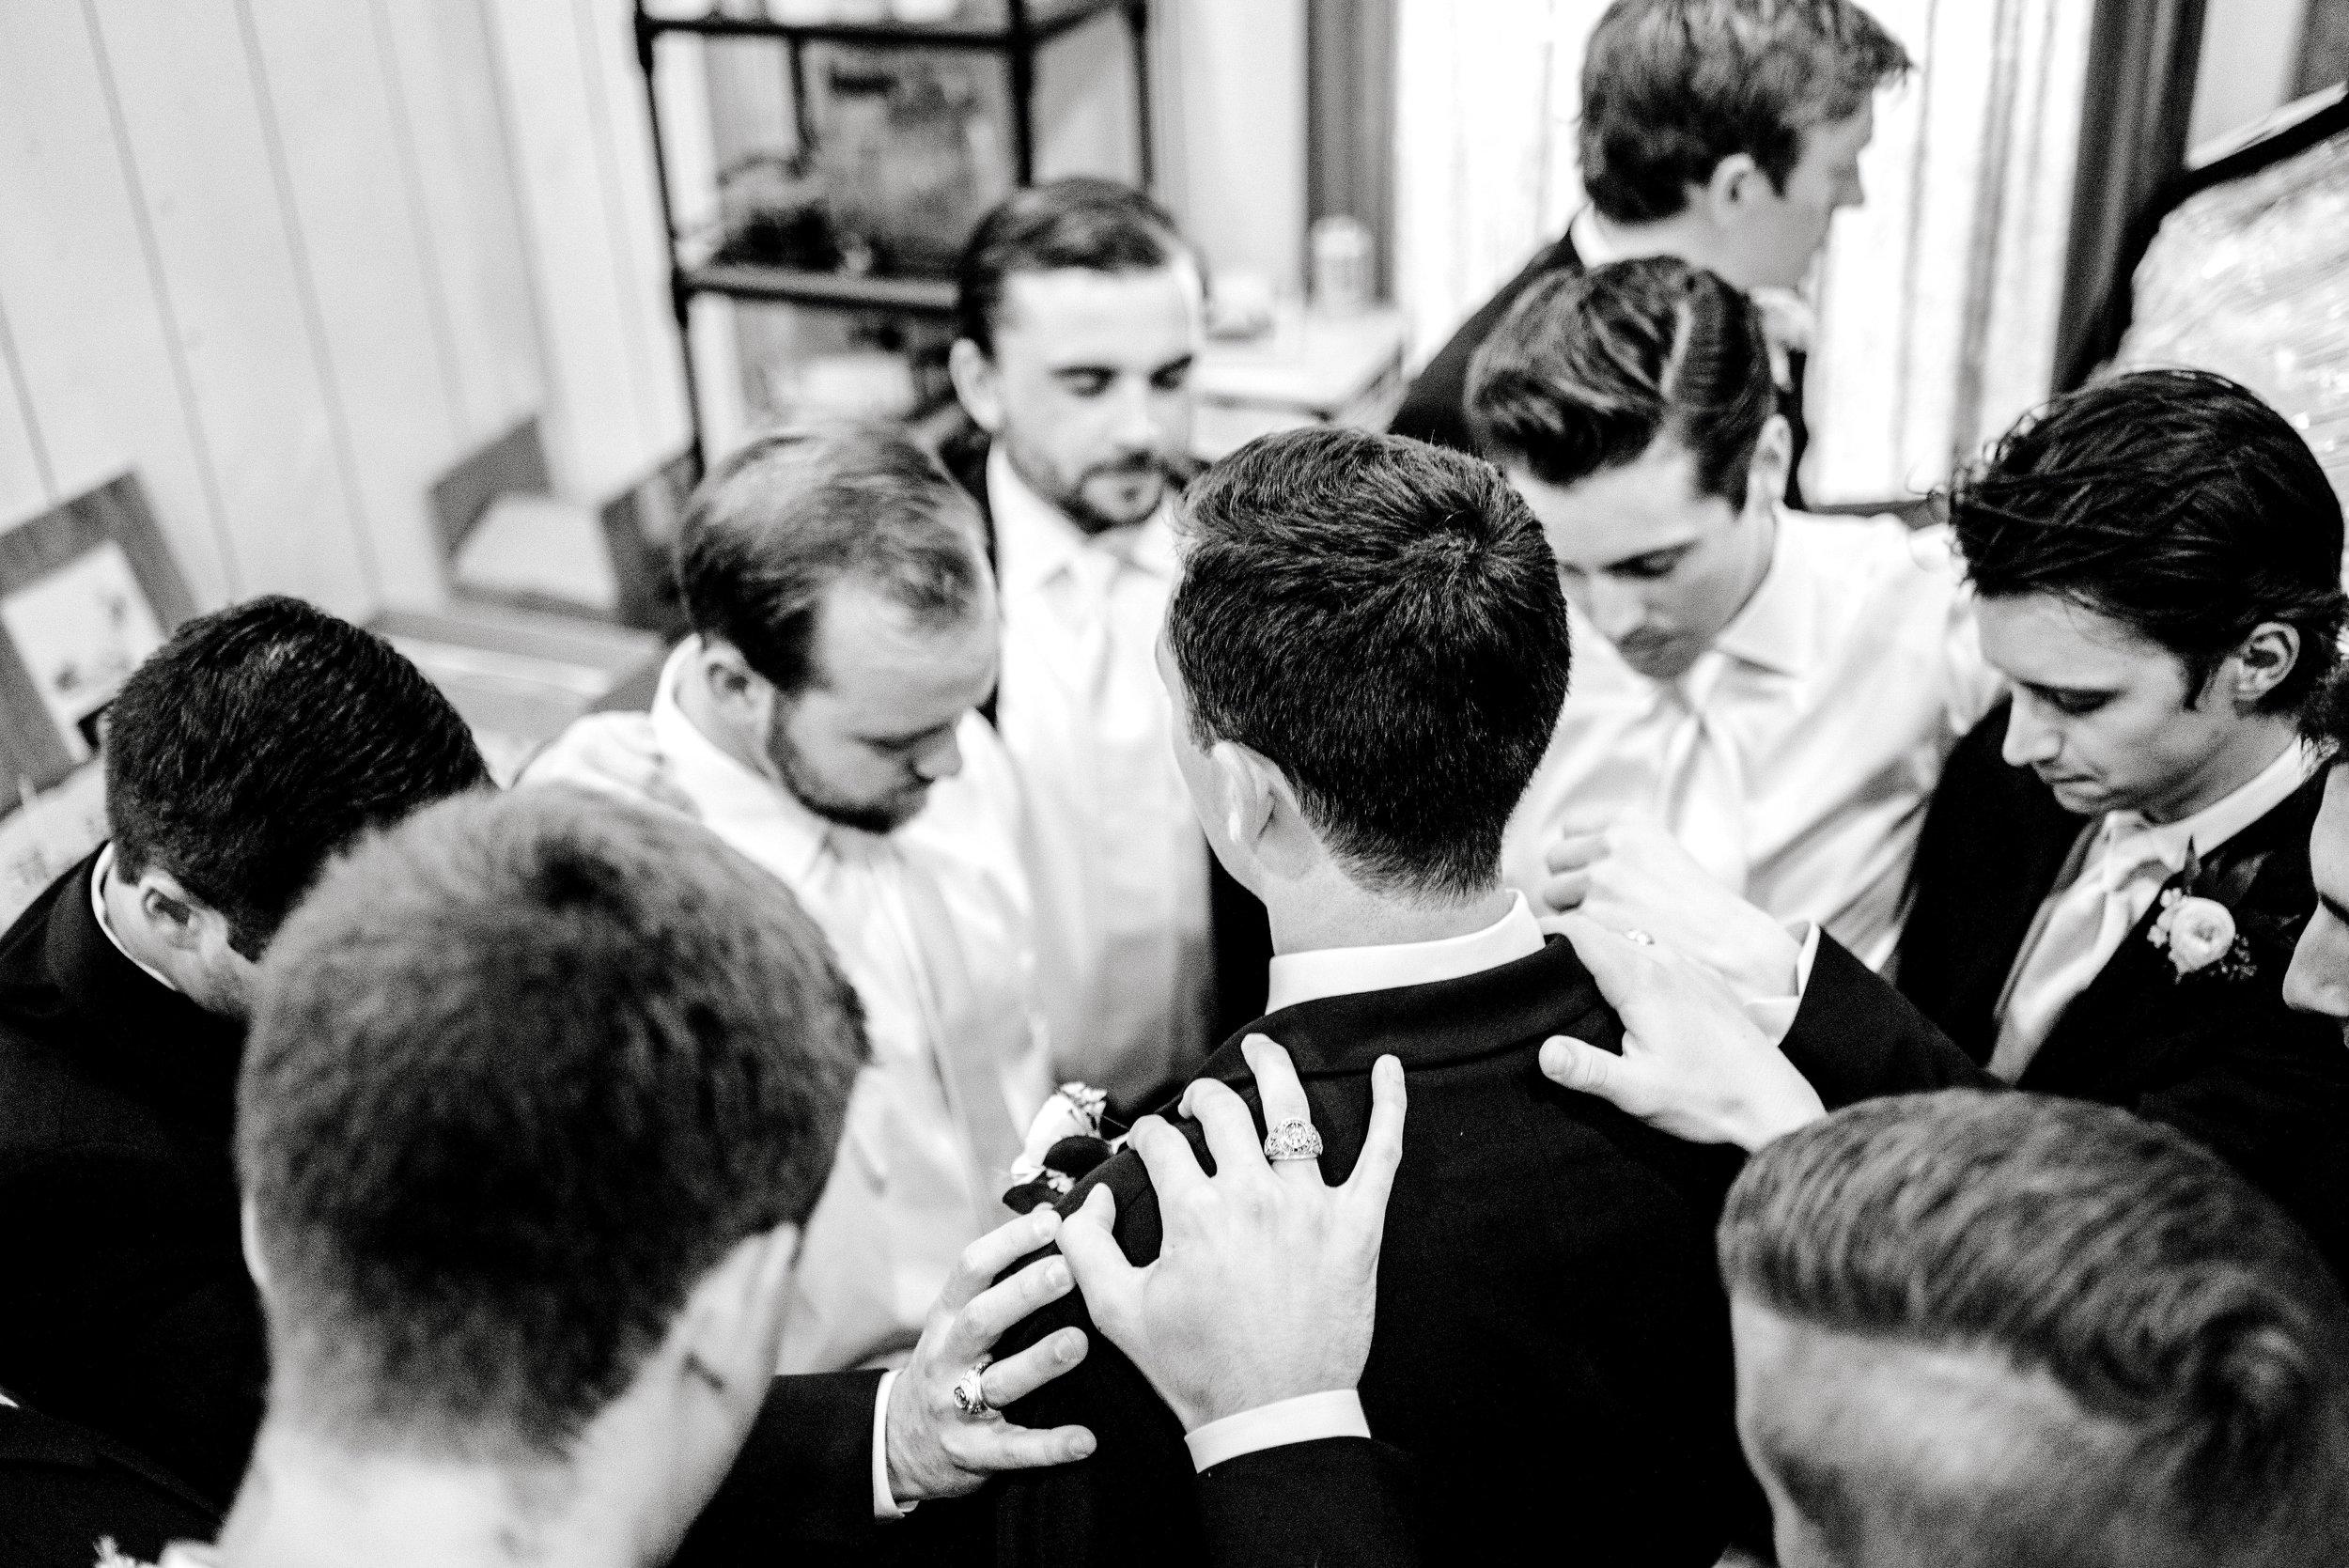 gray-door-photography-wedding-portraits-dallas-photographer-steph-erffmeyer9.jpg